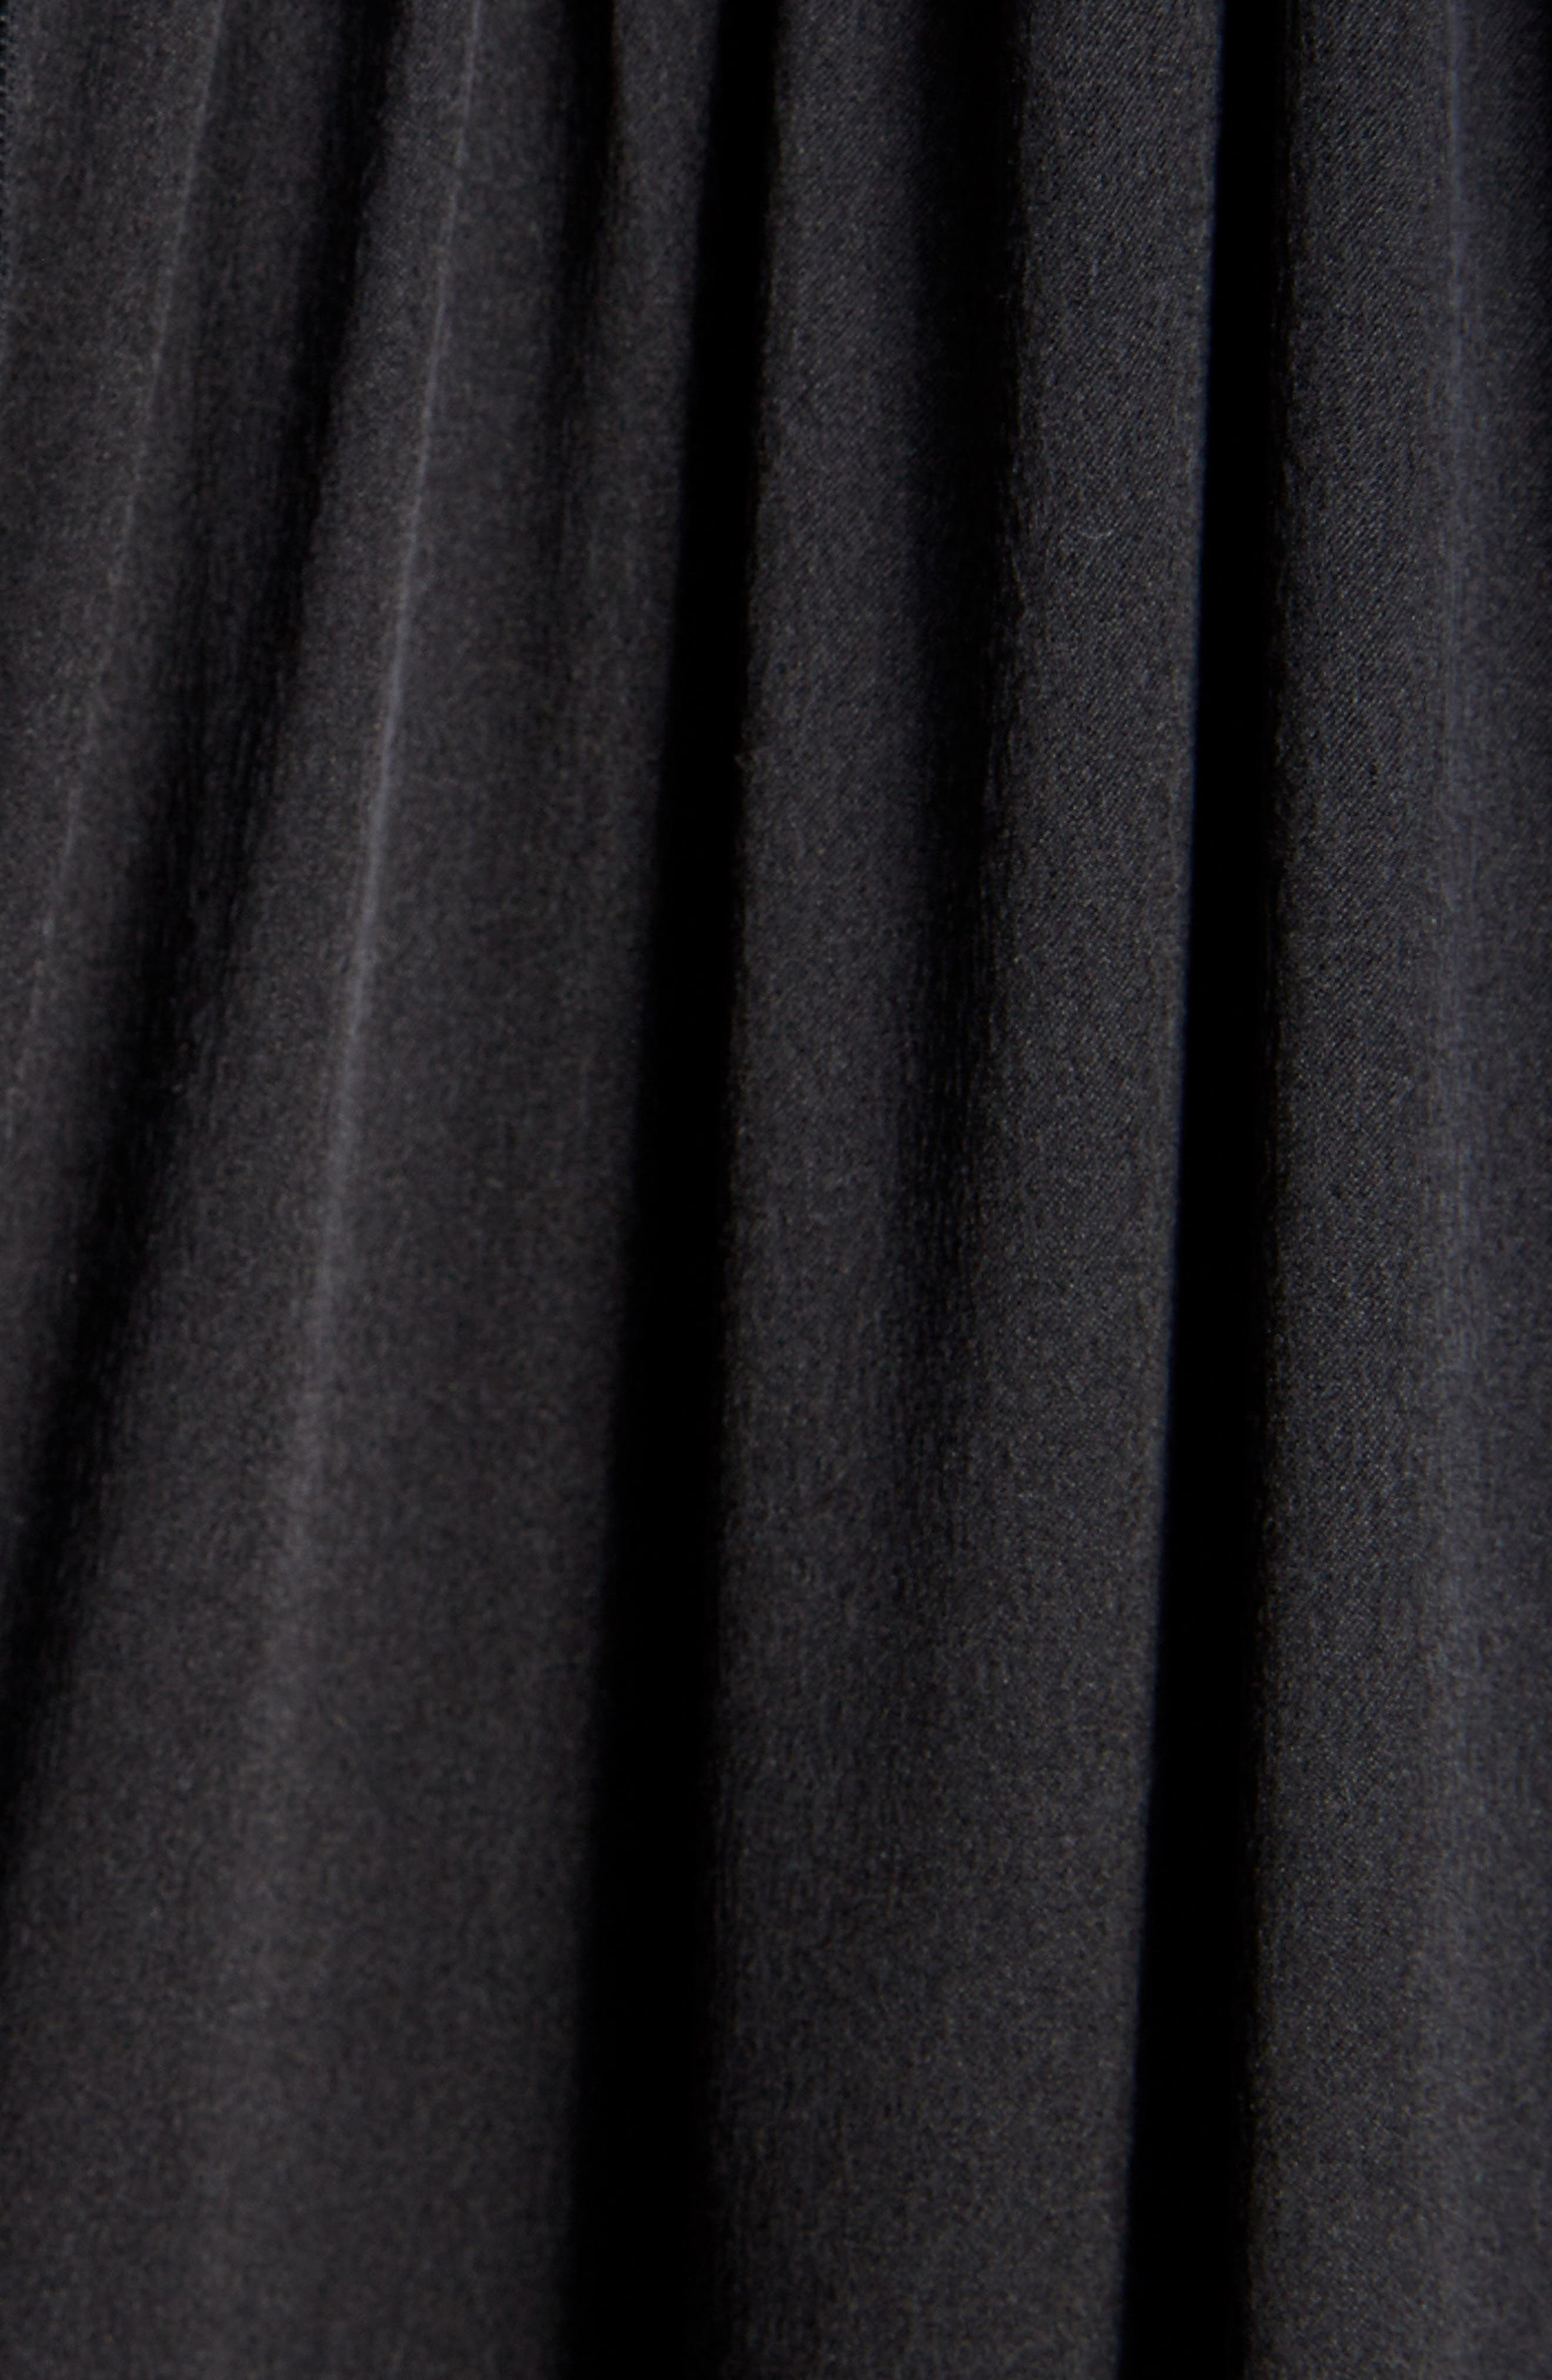 Frill Patchwork Dress,                             Alternate thumbnail 5, color,                             001